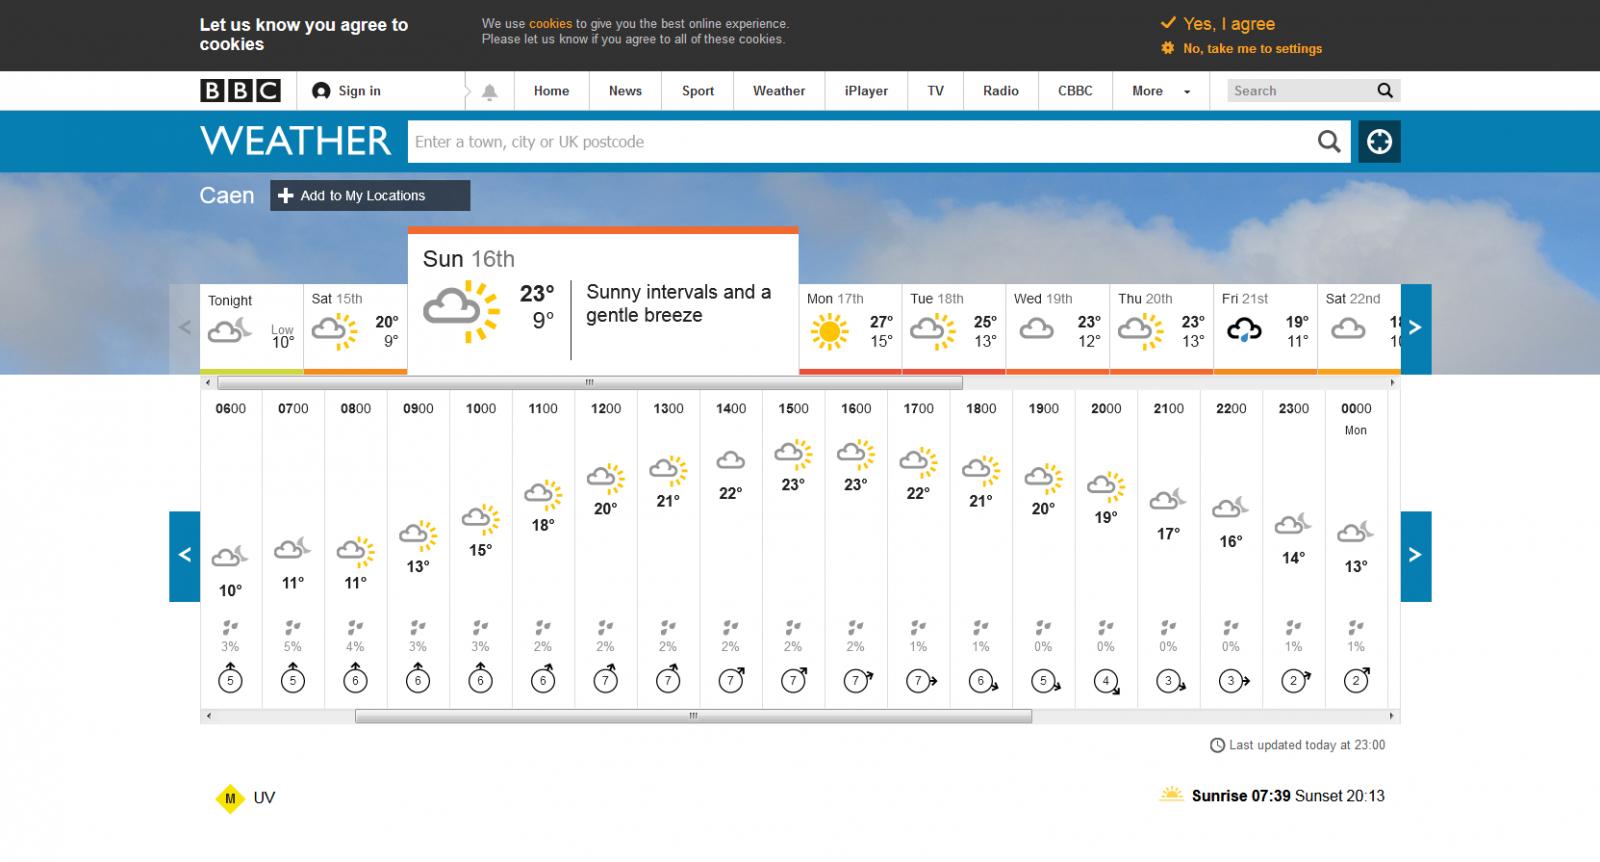 Screenshot_2018-09-14 Caen - BBC Weather.png